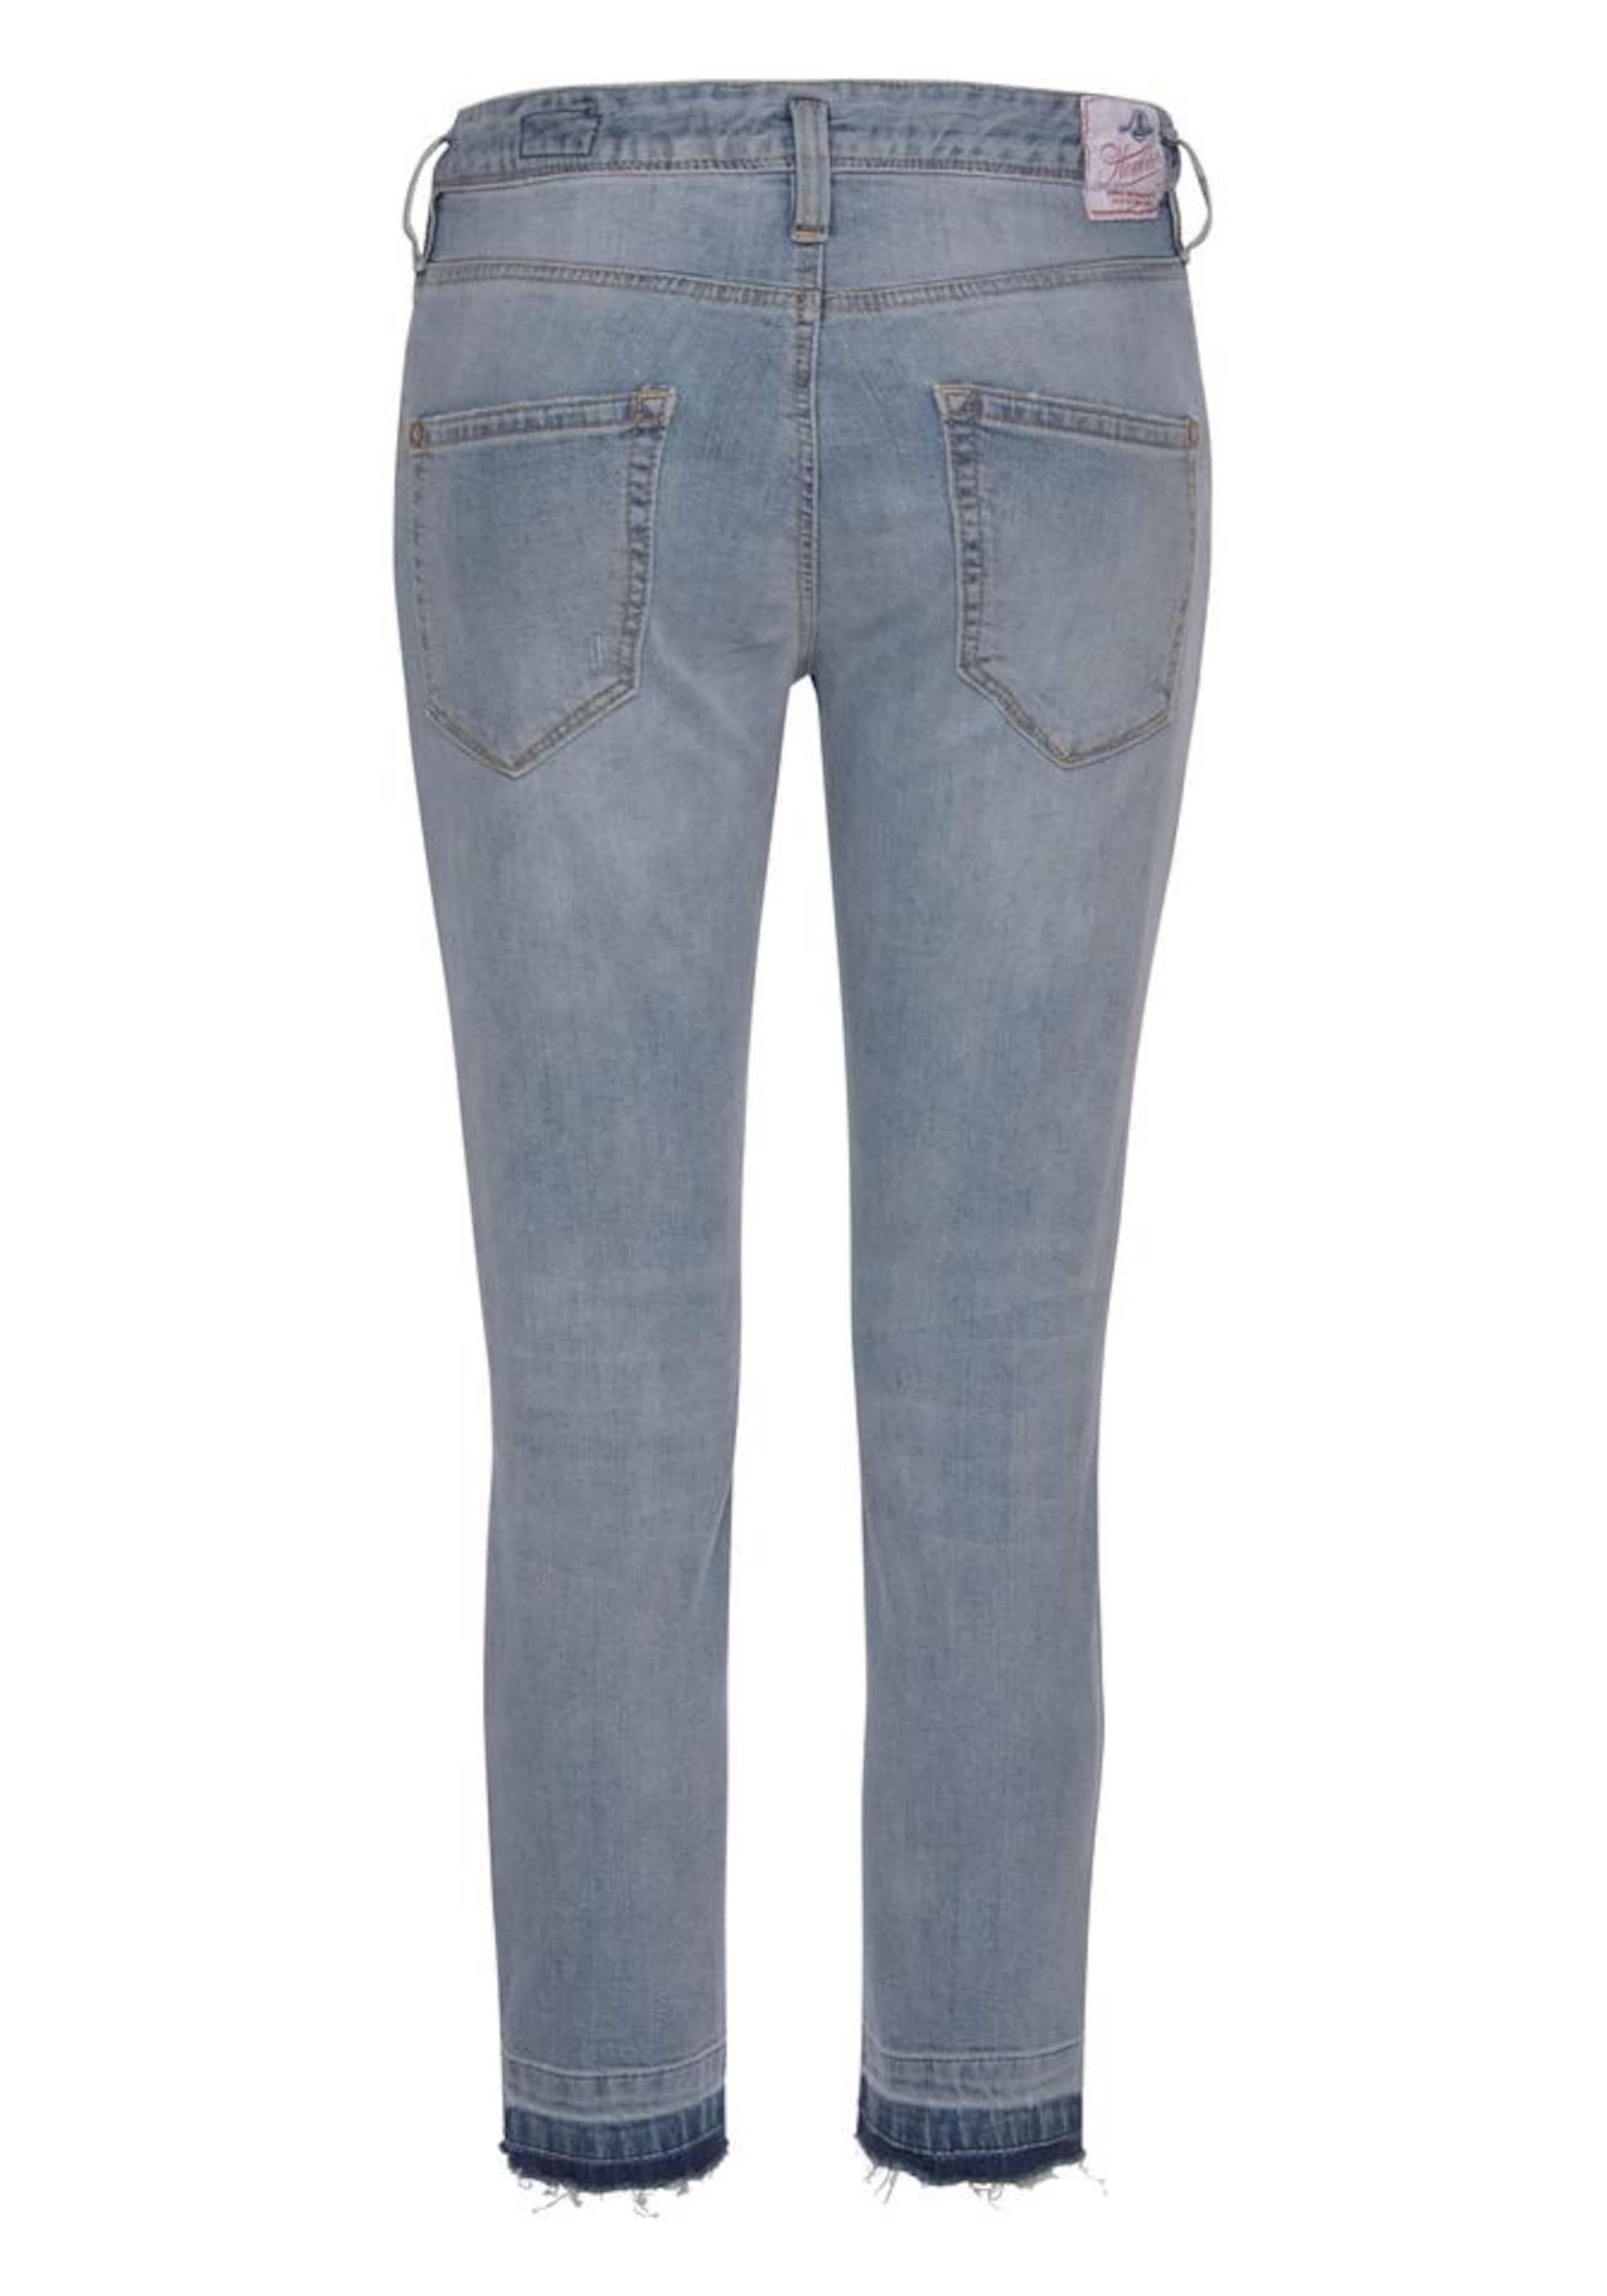 Cropped' Herrlicher Blue 'shyra In Denim Jeans 5A34jLqR